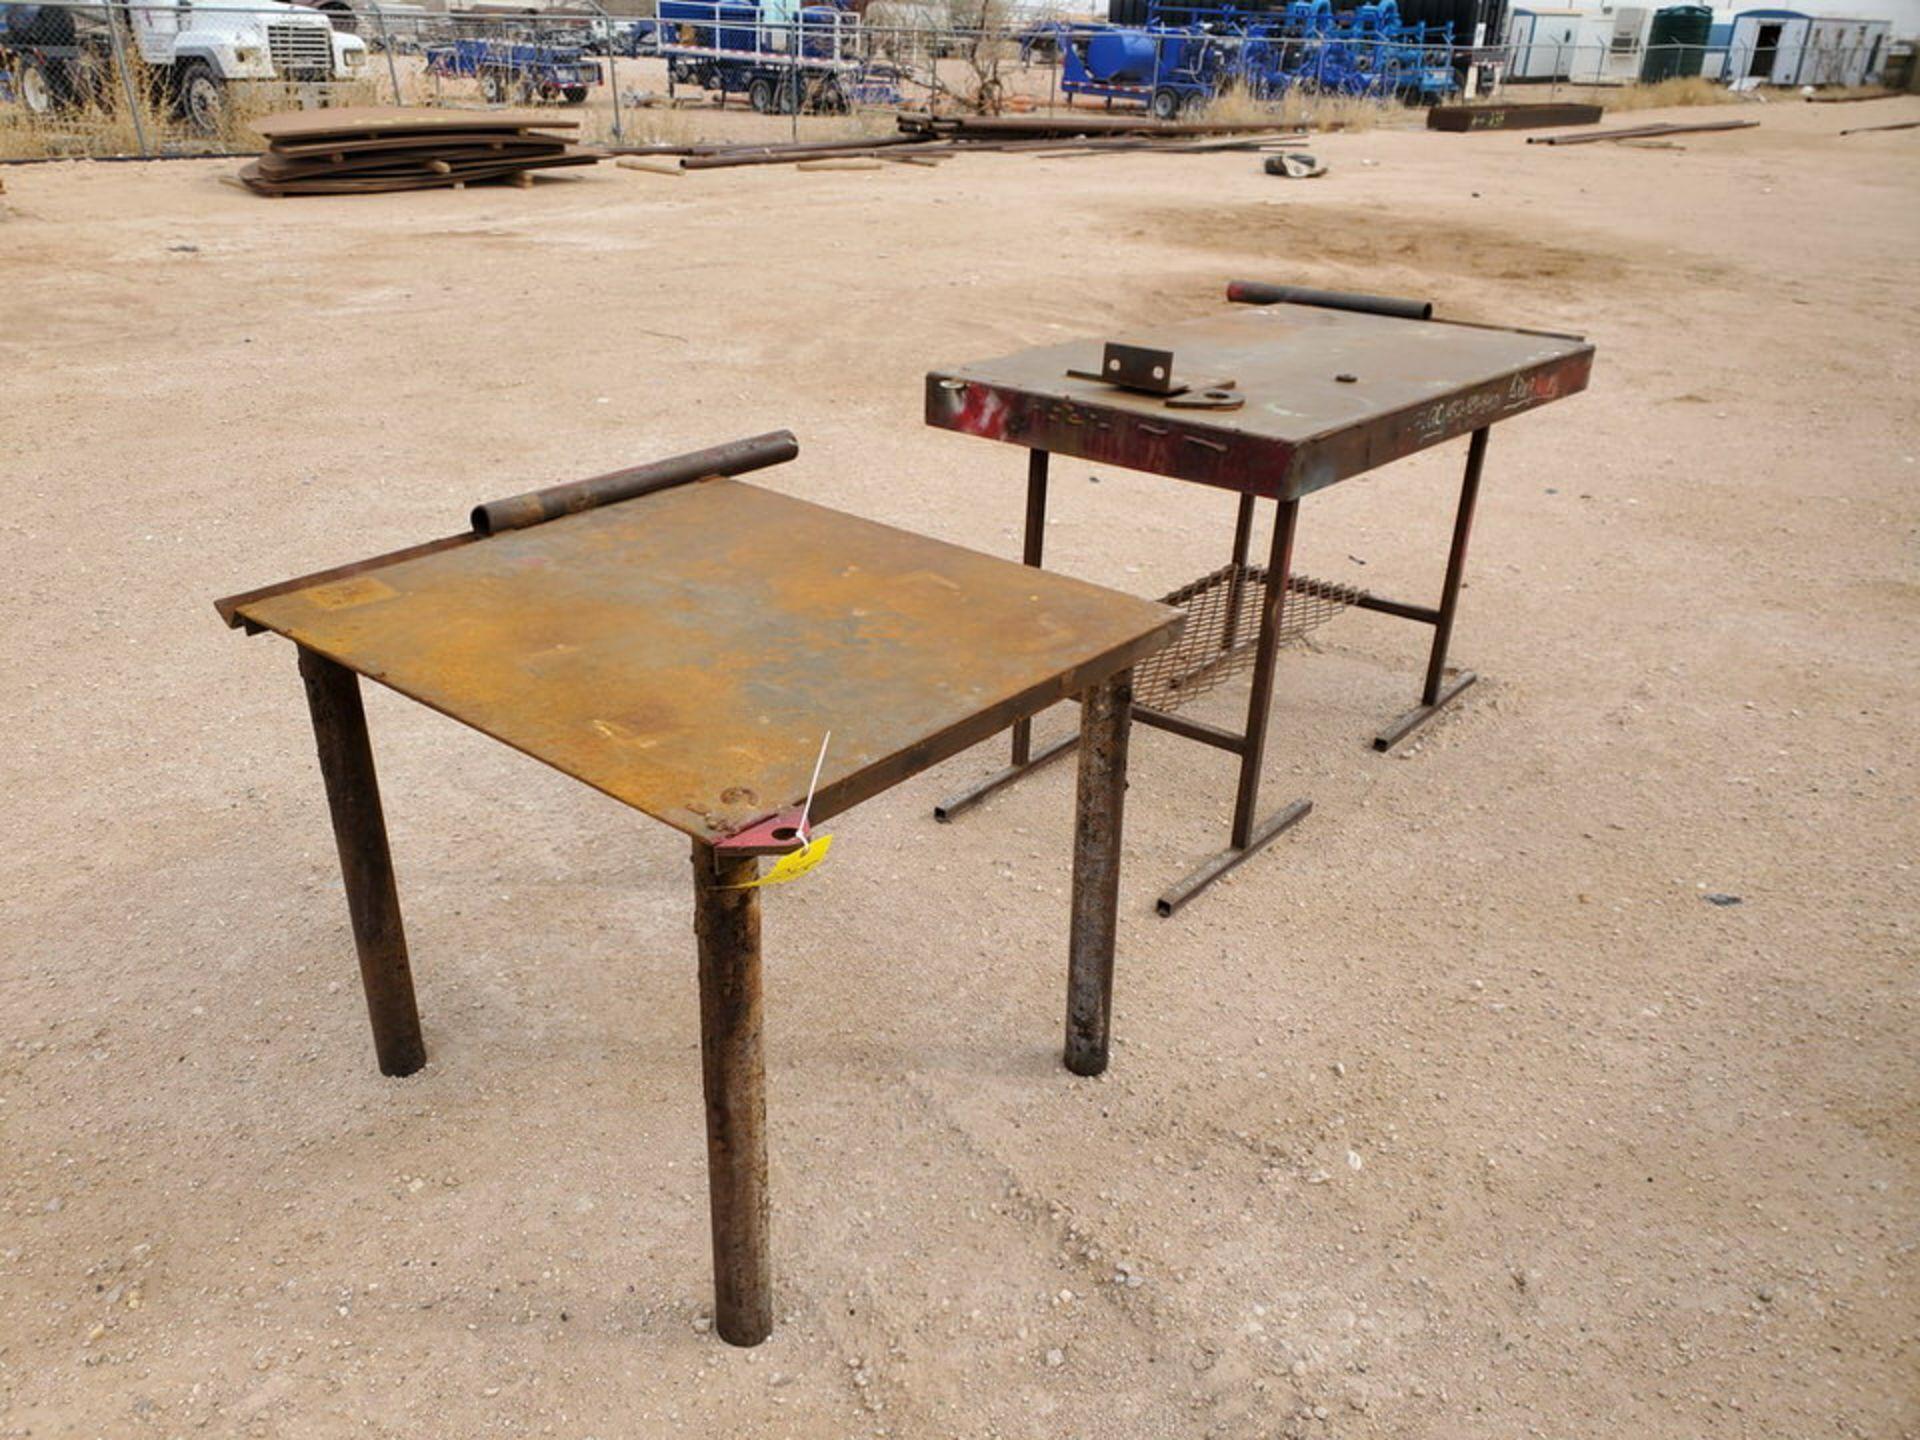 "(2) Stl Welding Tables (1) 36"" x 43"" x 30"", (1) 60"" x 29"" 36"""